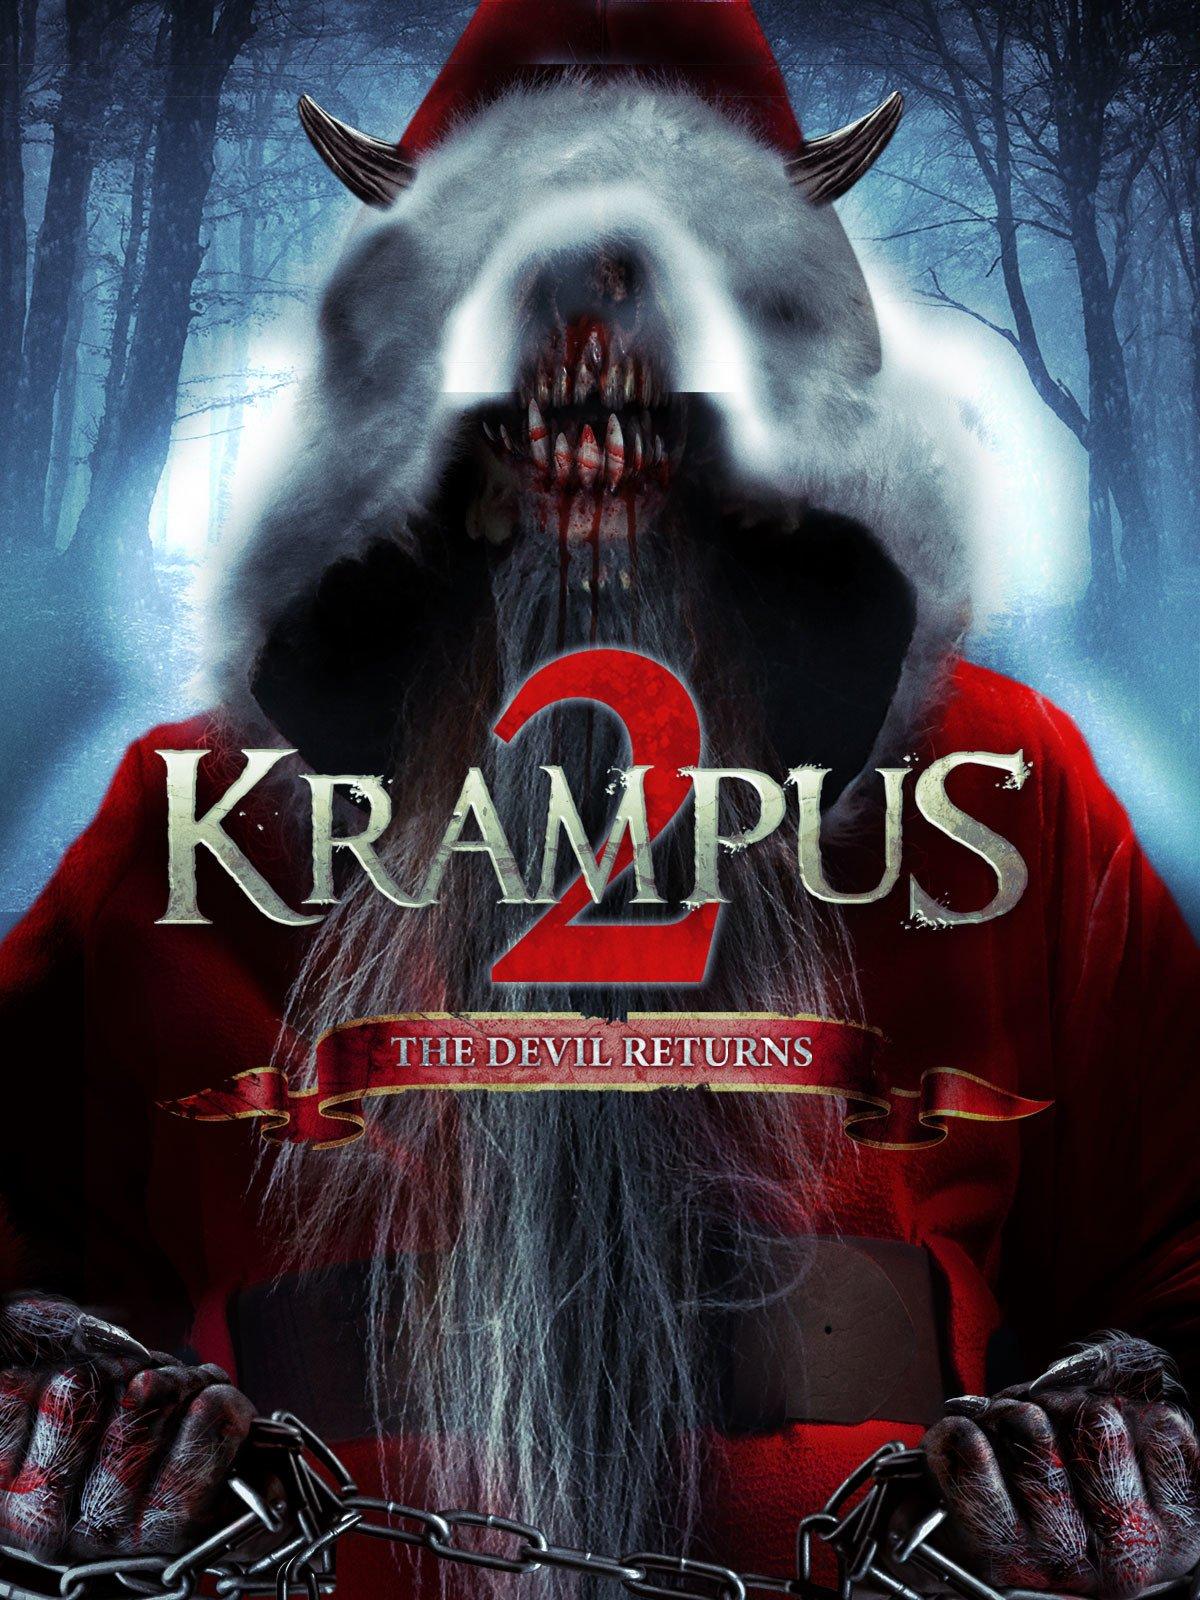 Krampus 2: The Devil Returns